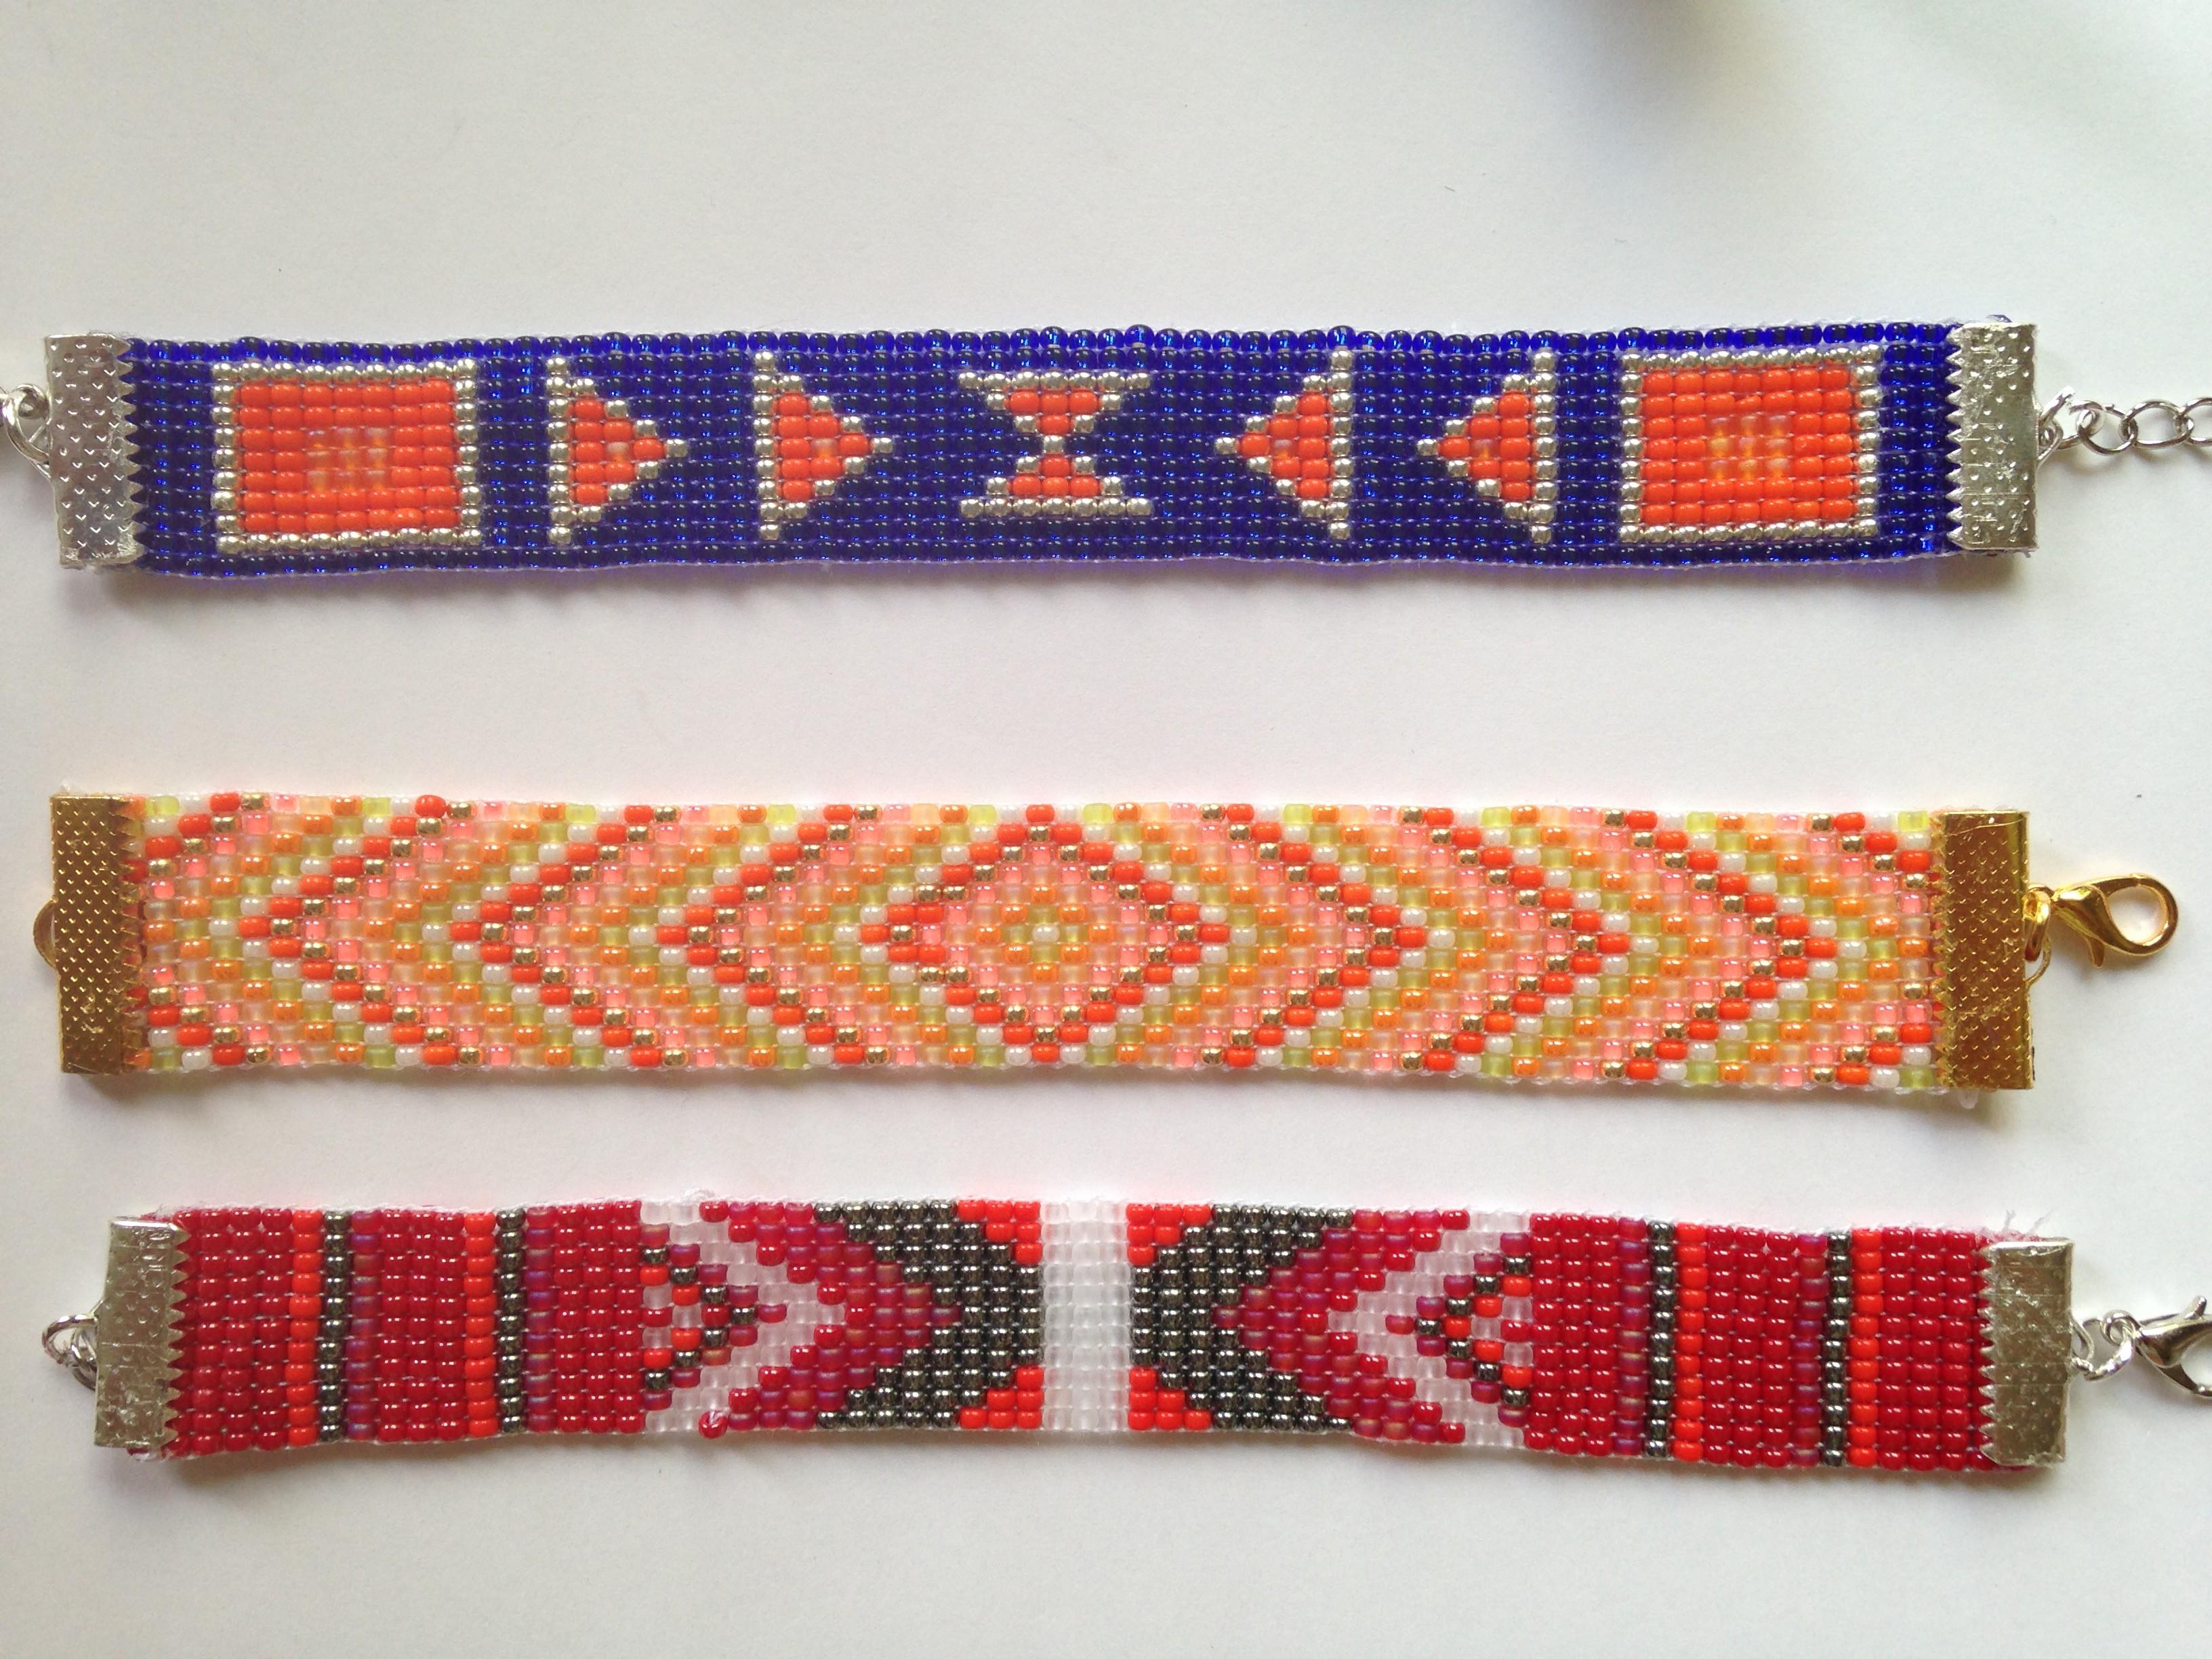 bracelets en tissage de perles coloris vari s miliecreation neya. Black Bedroom Furniture Sets. Home Design Ideas